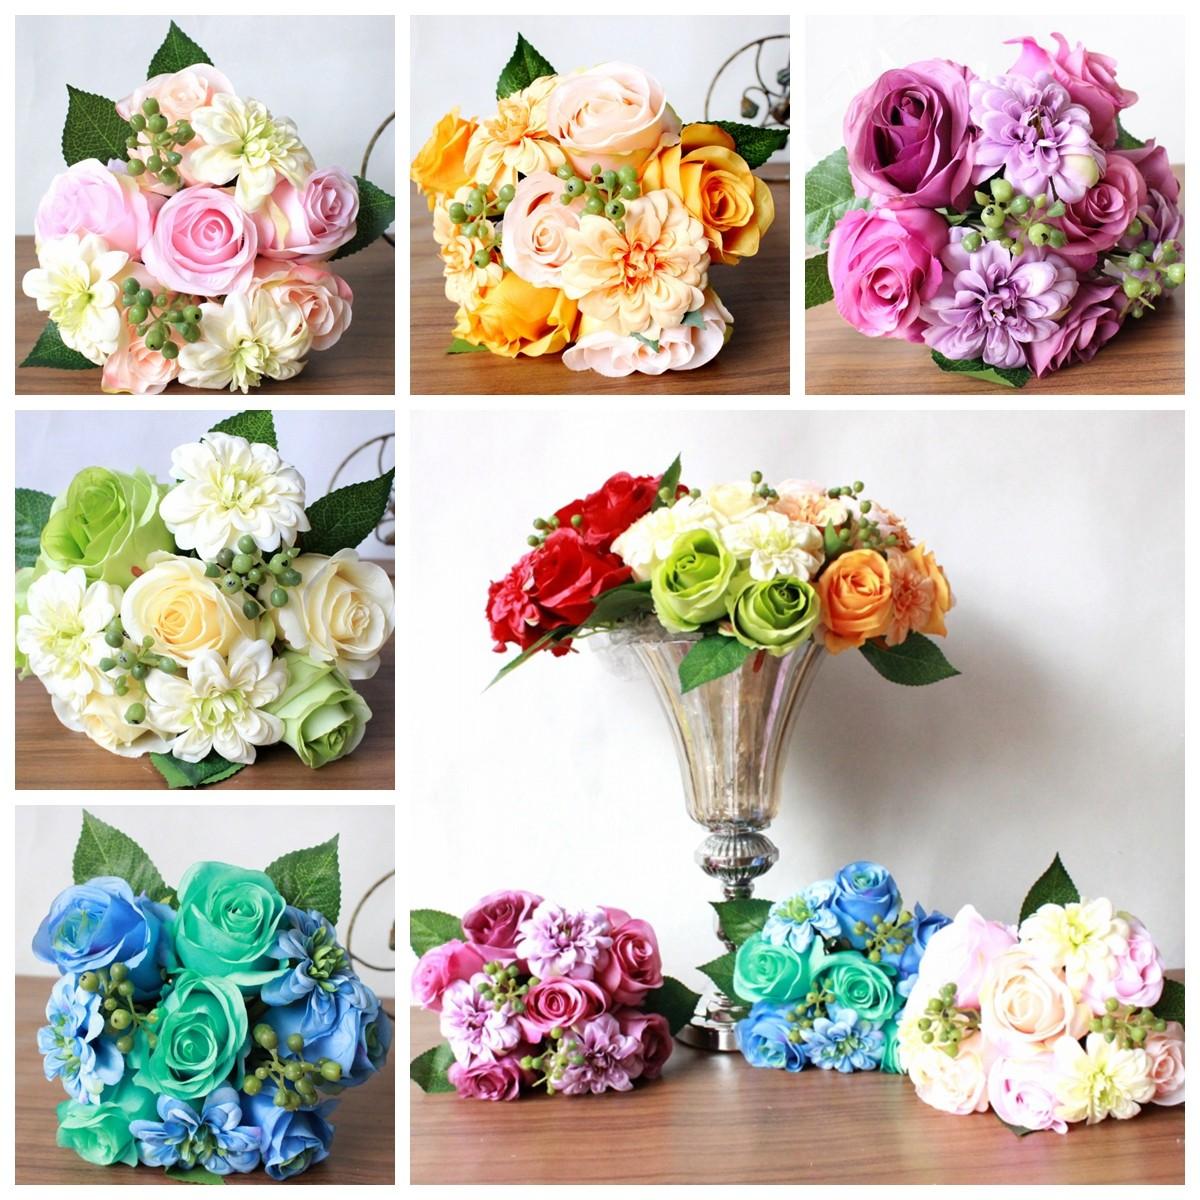 Rose Dahlia Flower Simulation Silk Flower Wholesale New Hot Korean Holding Fl